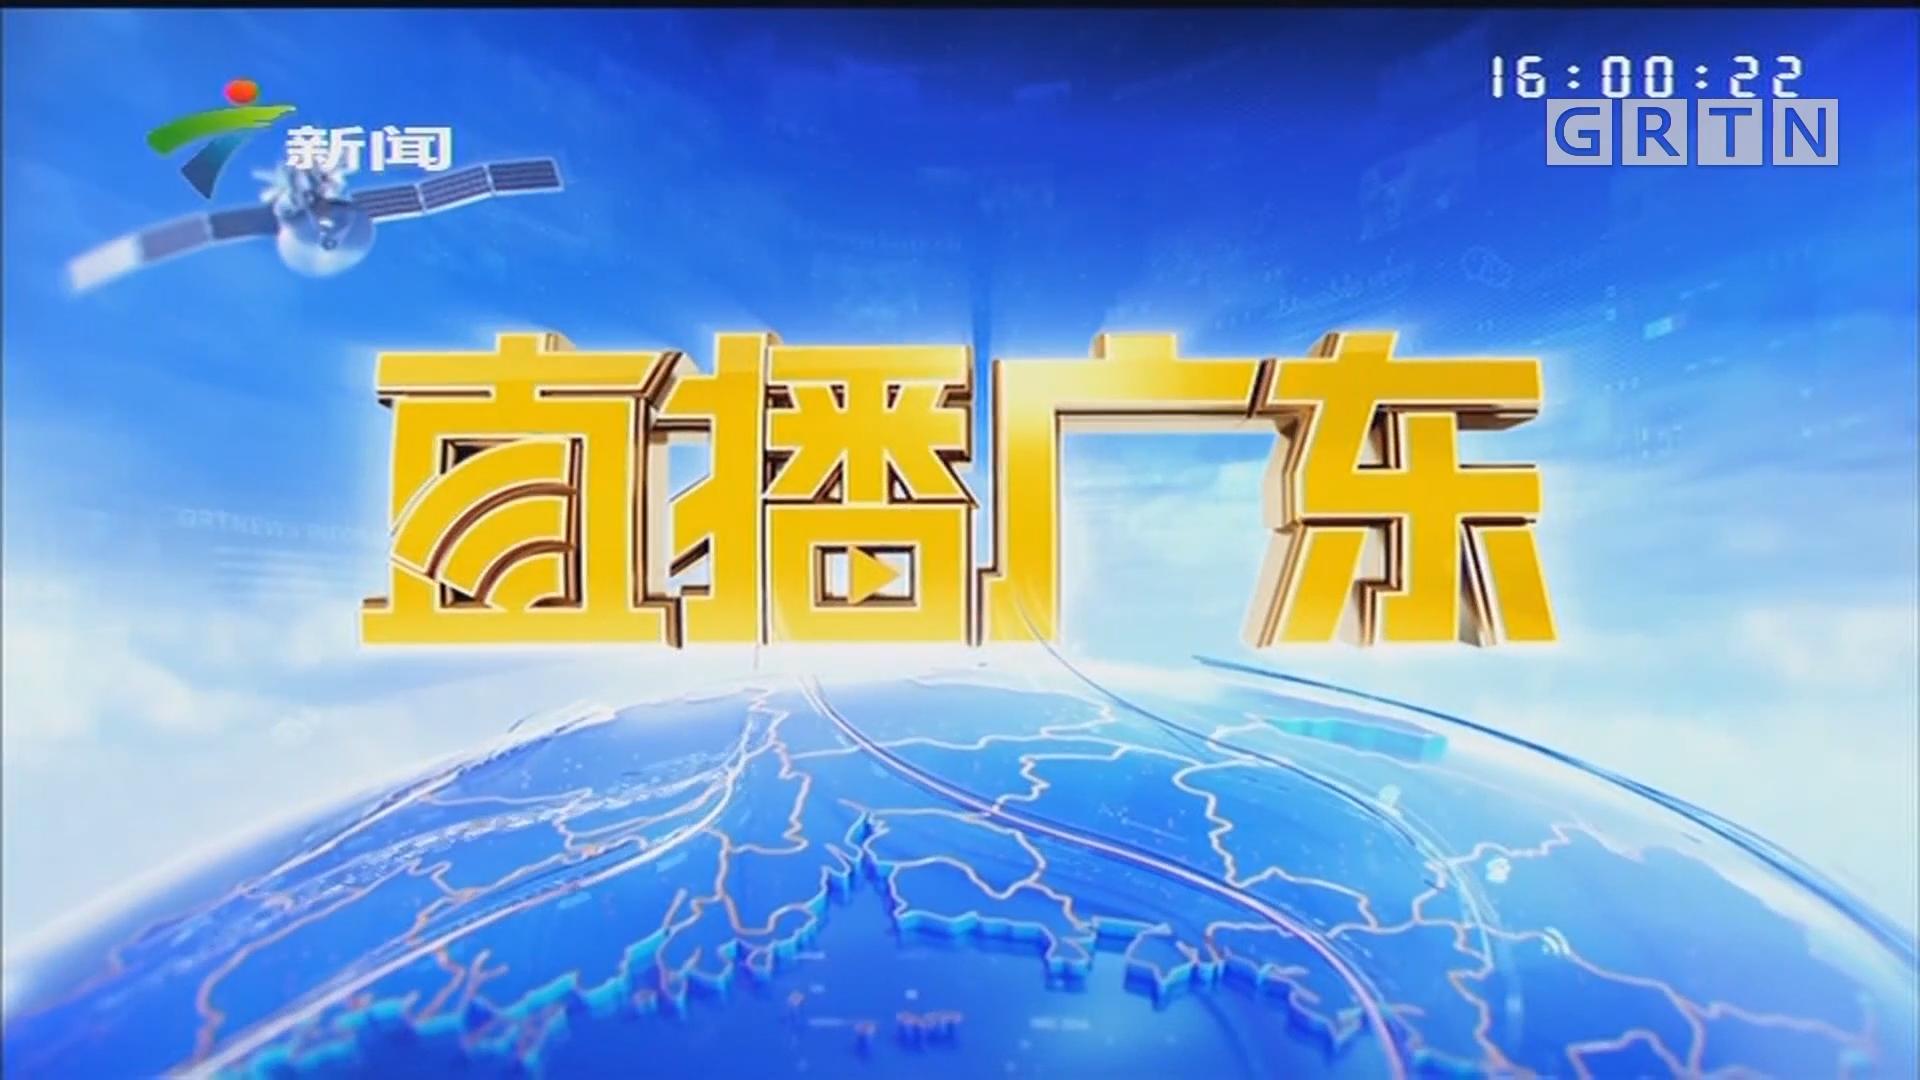 [HD][2019-06-09]直播广东:记者直击端午返程:广东全省高速公路平稳有序